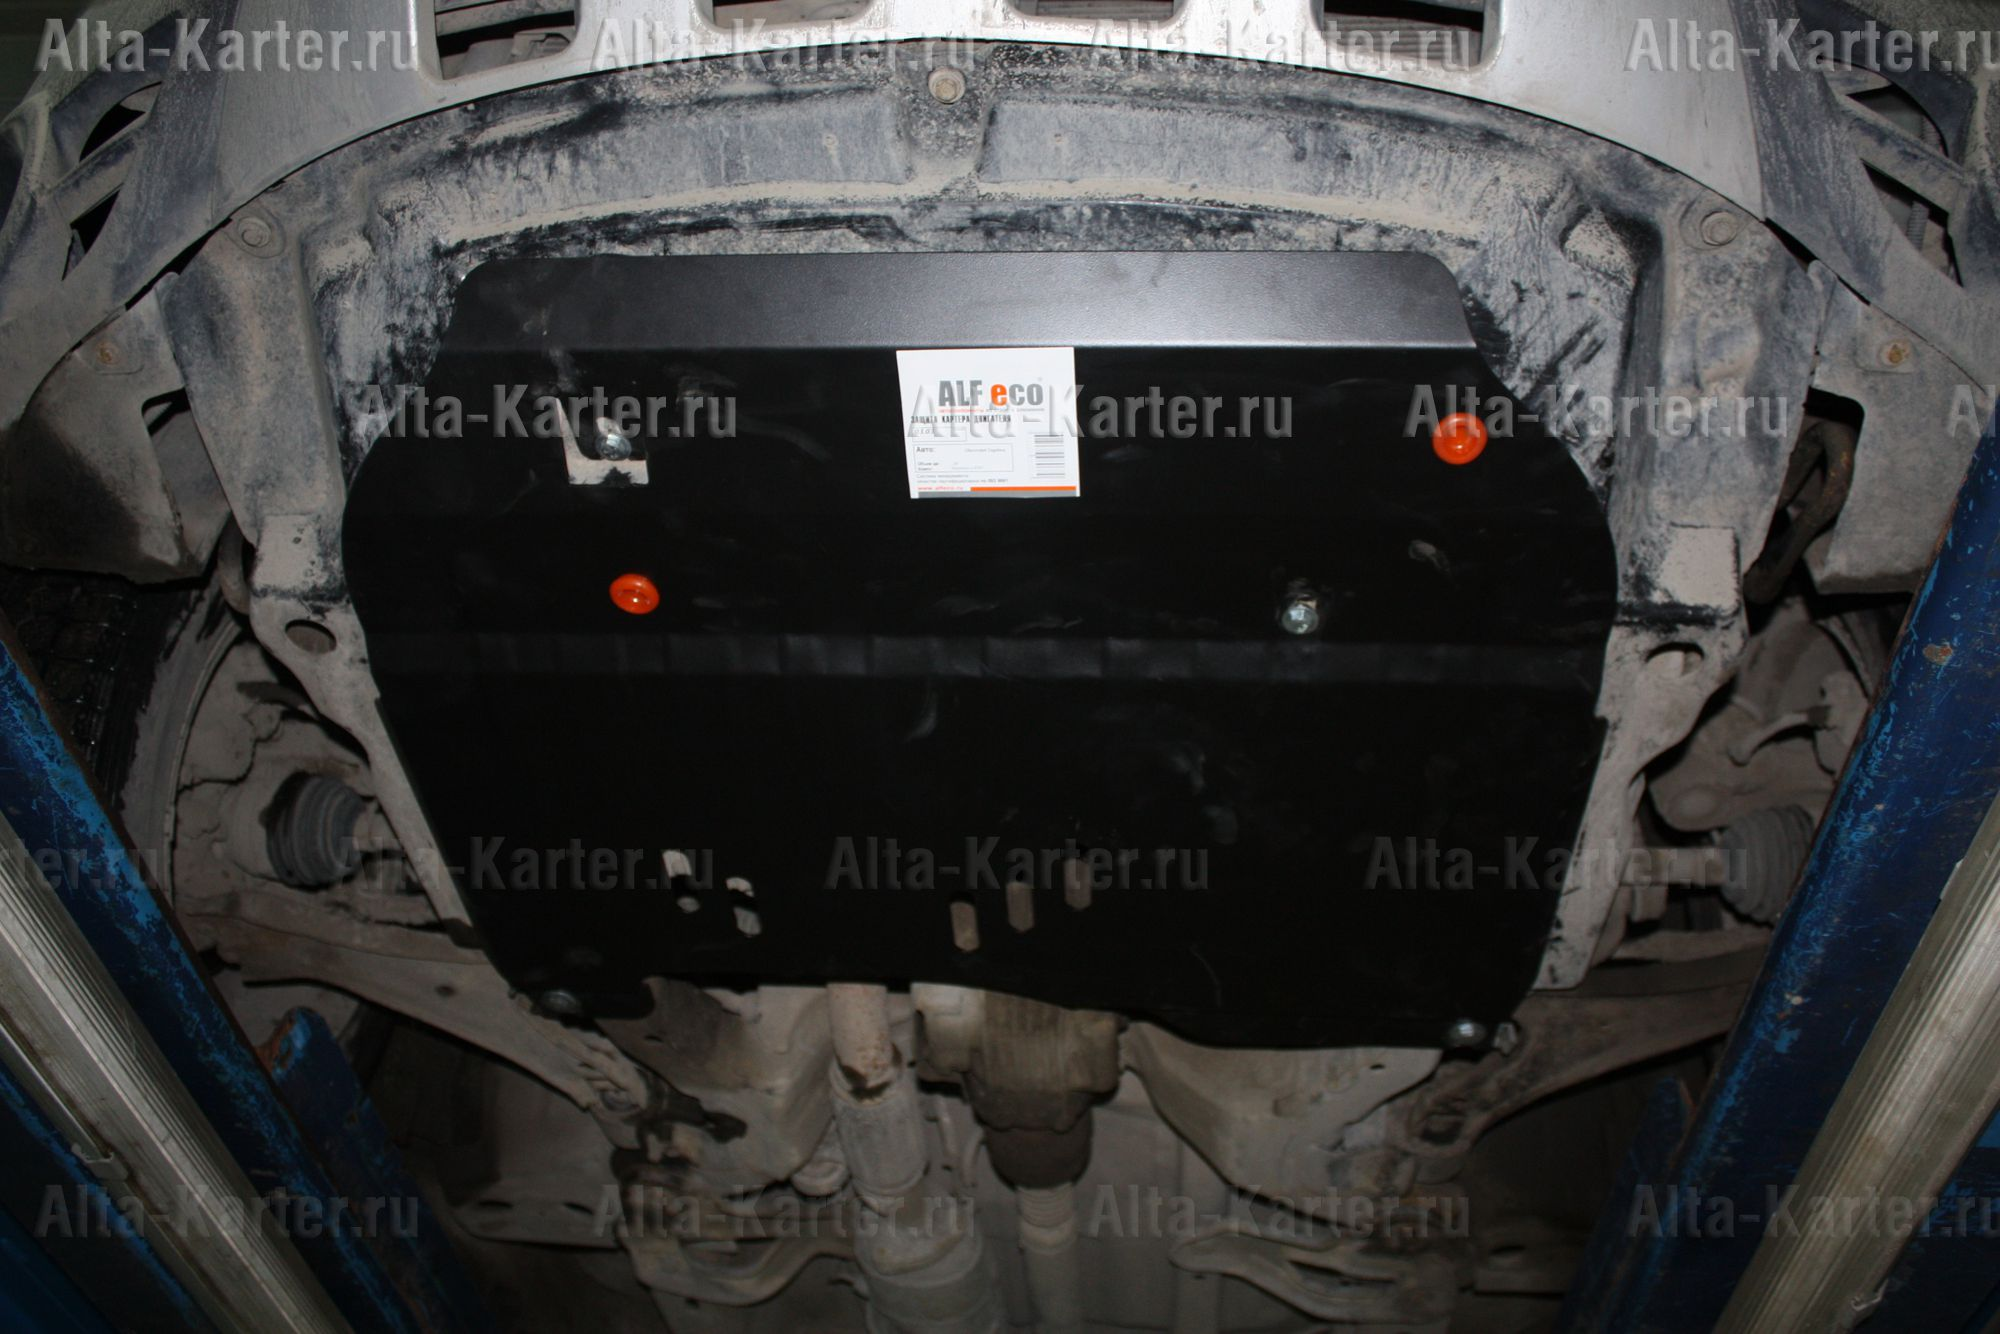 Защита Alfeco для картера и КПП Opel Antara 2006-2011. Артикул ALF.16.01